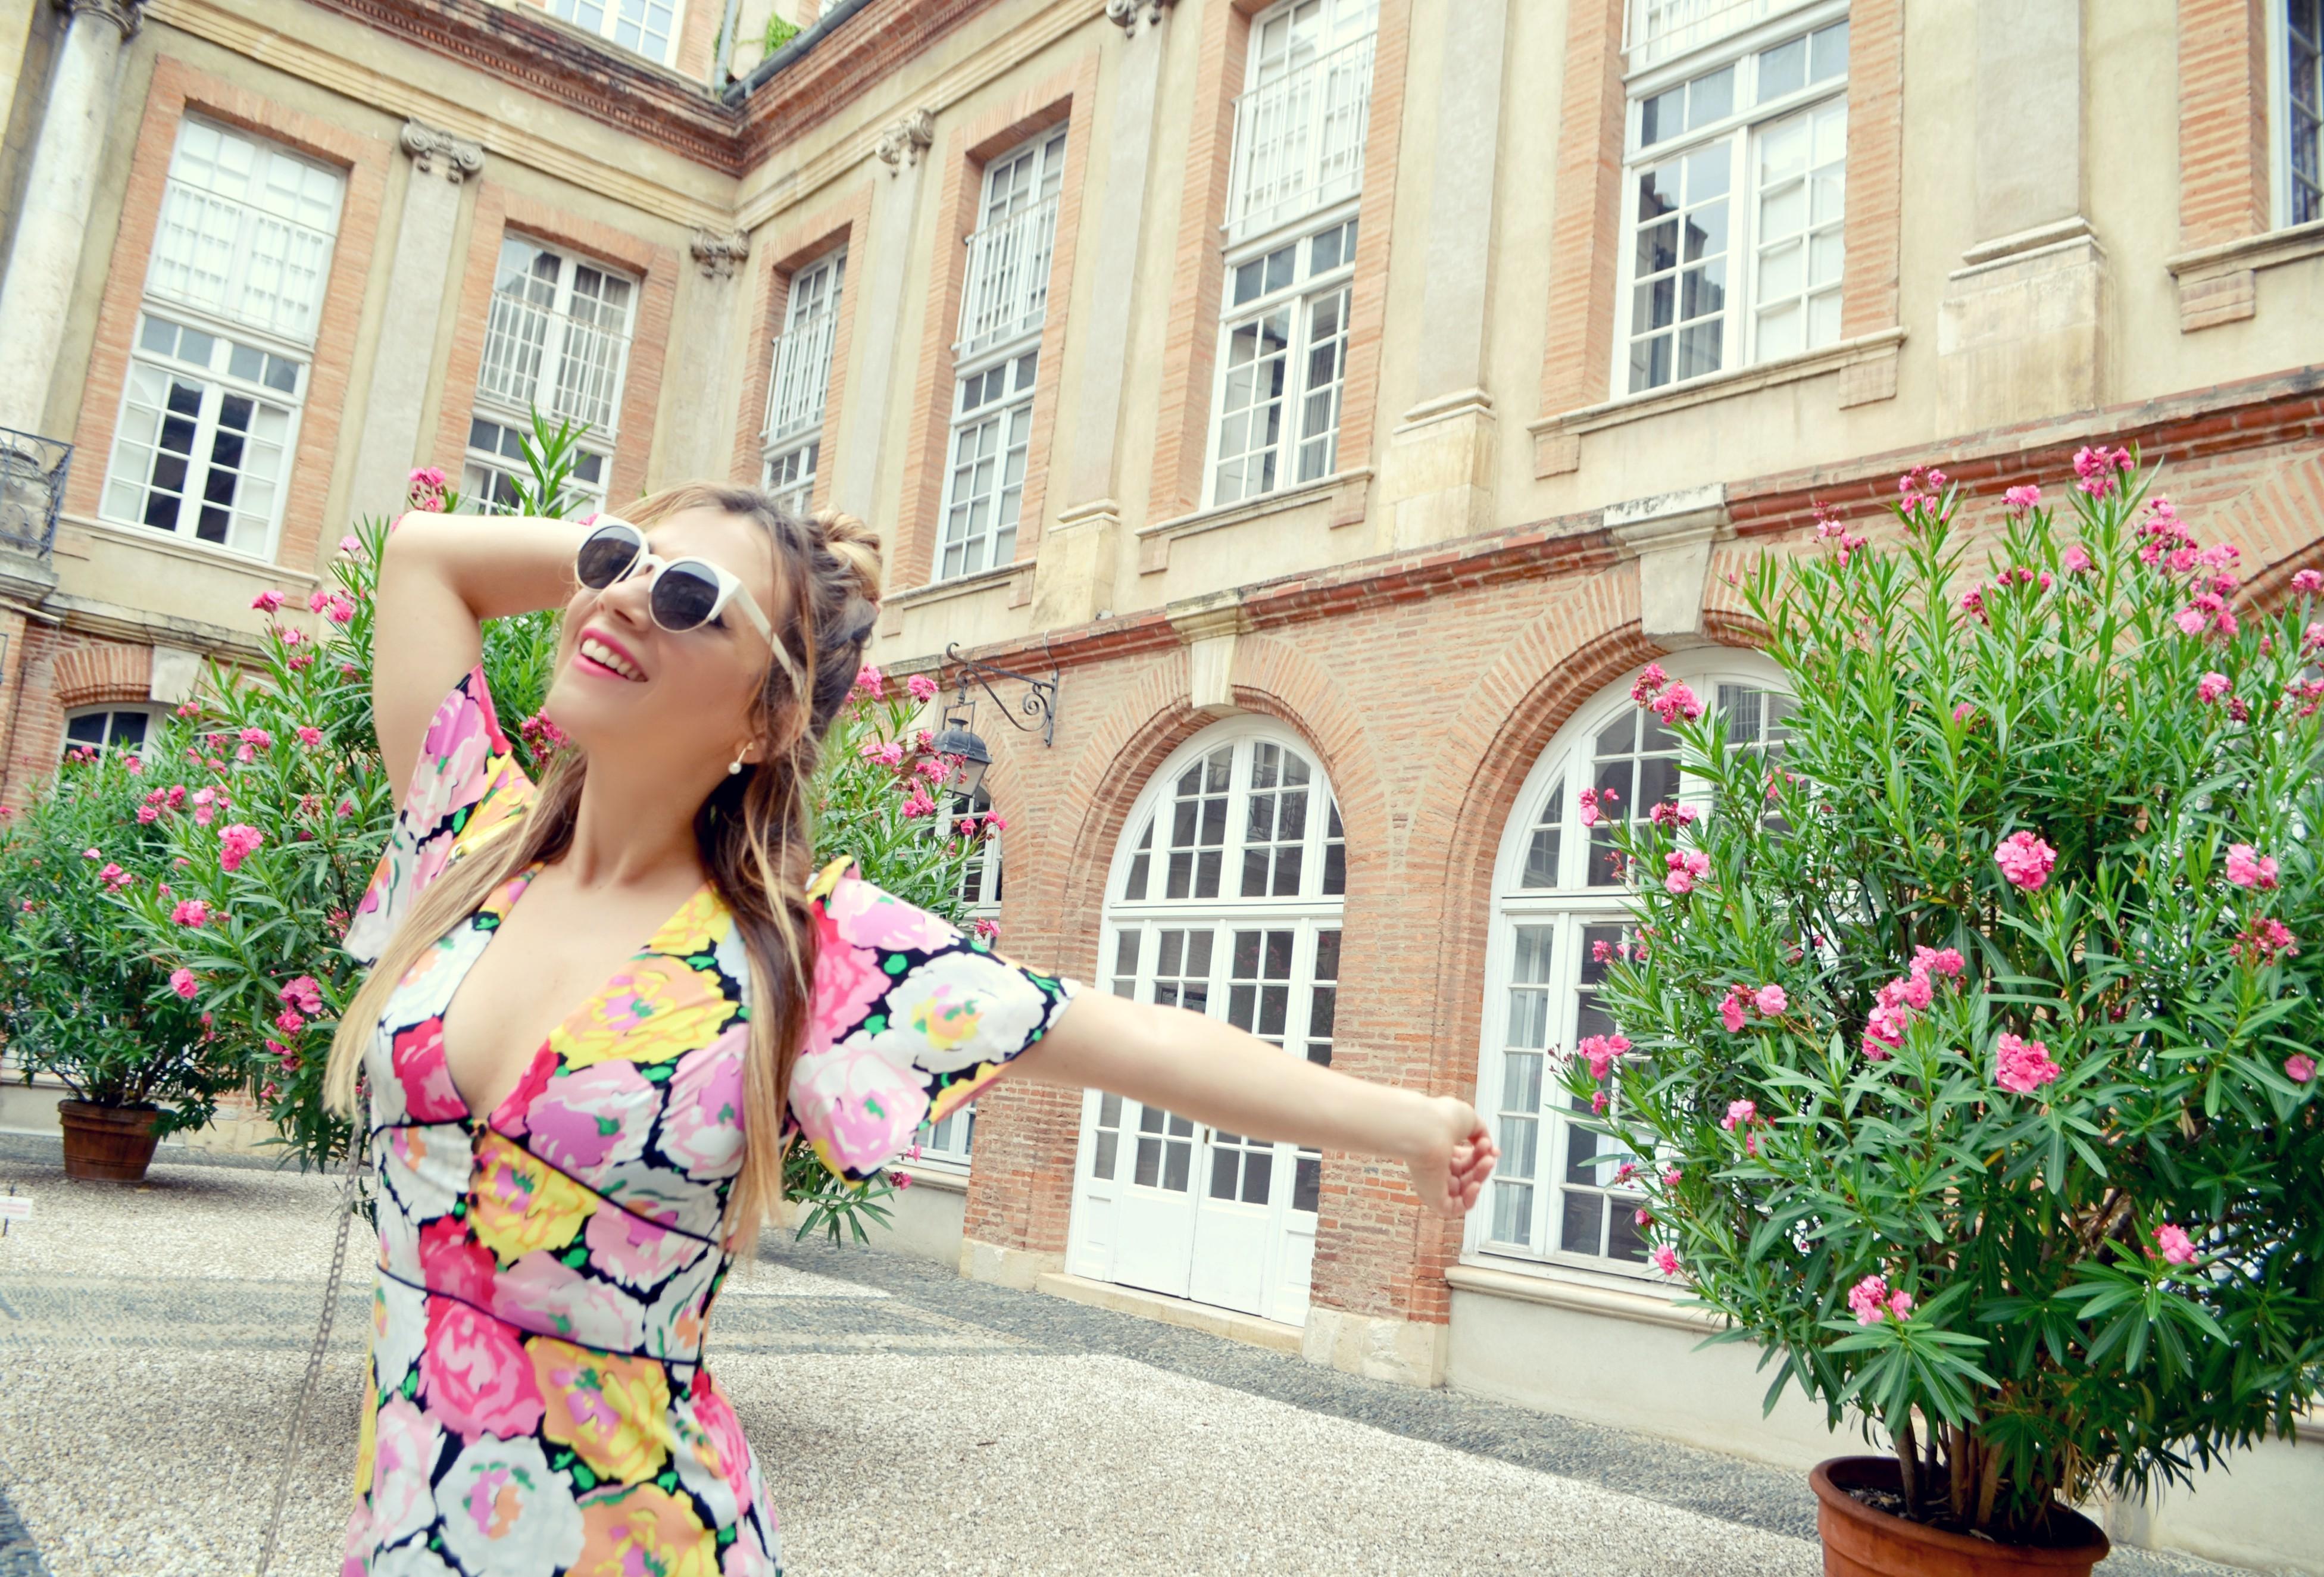 Vestido-de-flores-Zara-blog-de-moda-Chic-Adicta-influencer-Chic-Adicta-fashionista-flower-dress-verono-PiensaenChic-Piensa-en-Chic